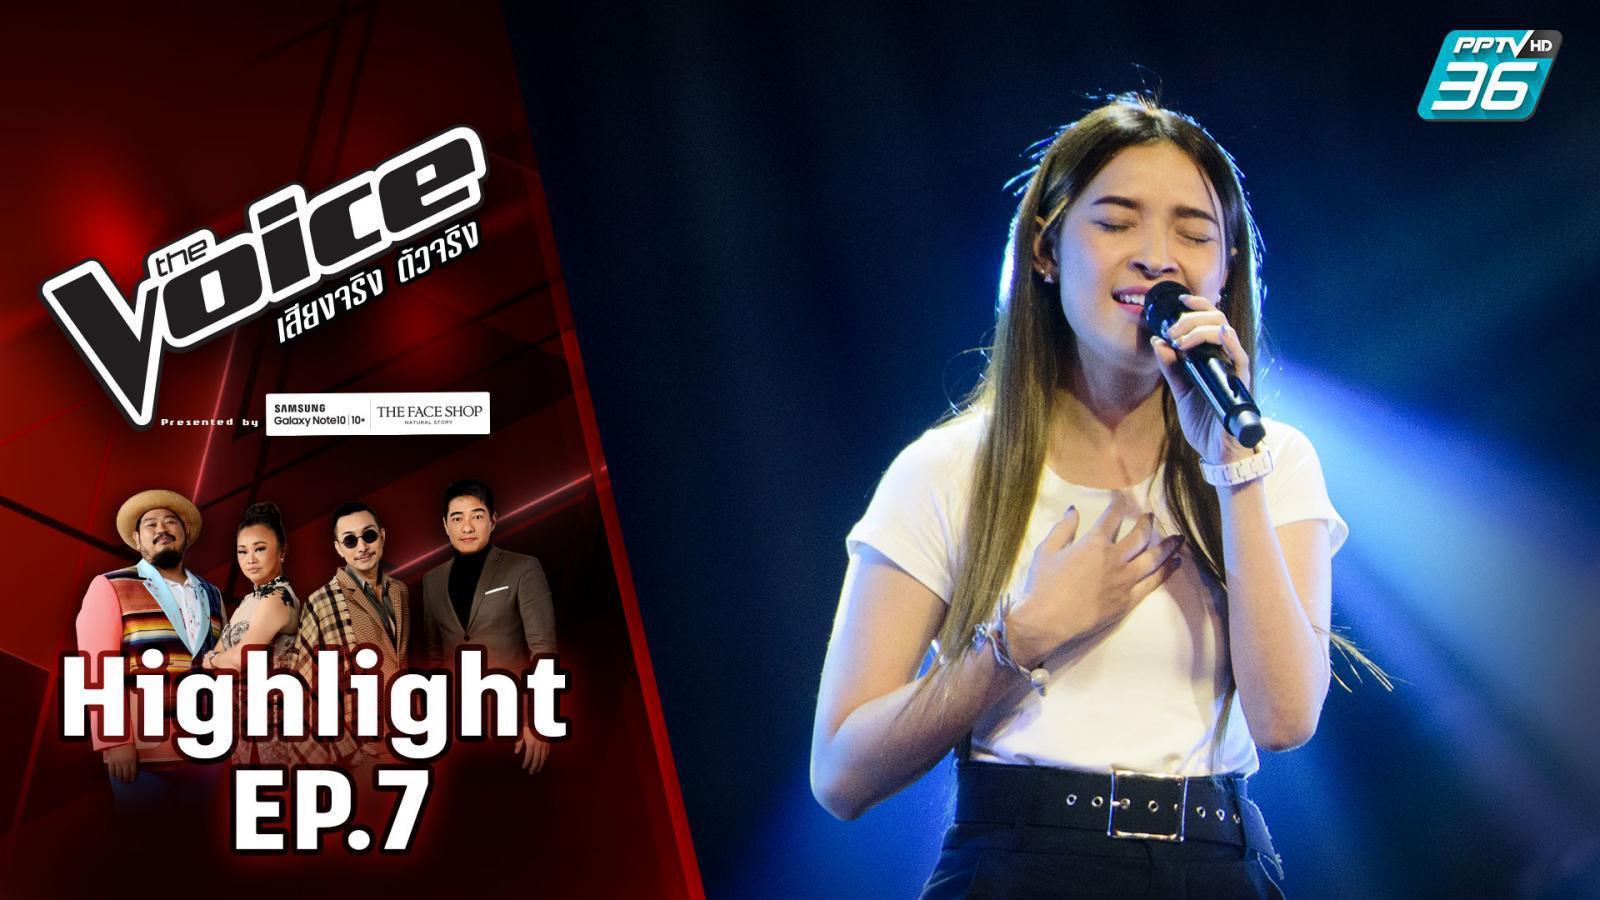 The Voice 2019 | 'เอิร์ท' สาวสวยเสียงใส ในบทเพลงซึ้งที่โค้ชป๊อบฟังแล้วอิ่มใจ  | Highlight EP7